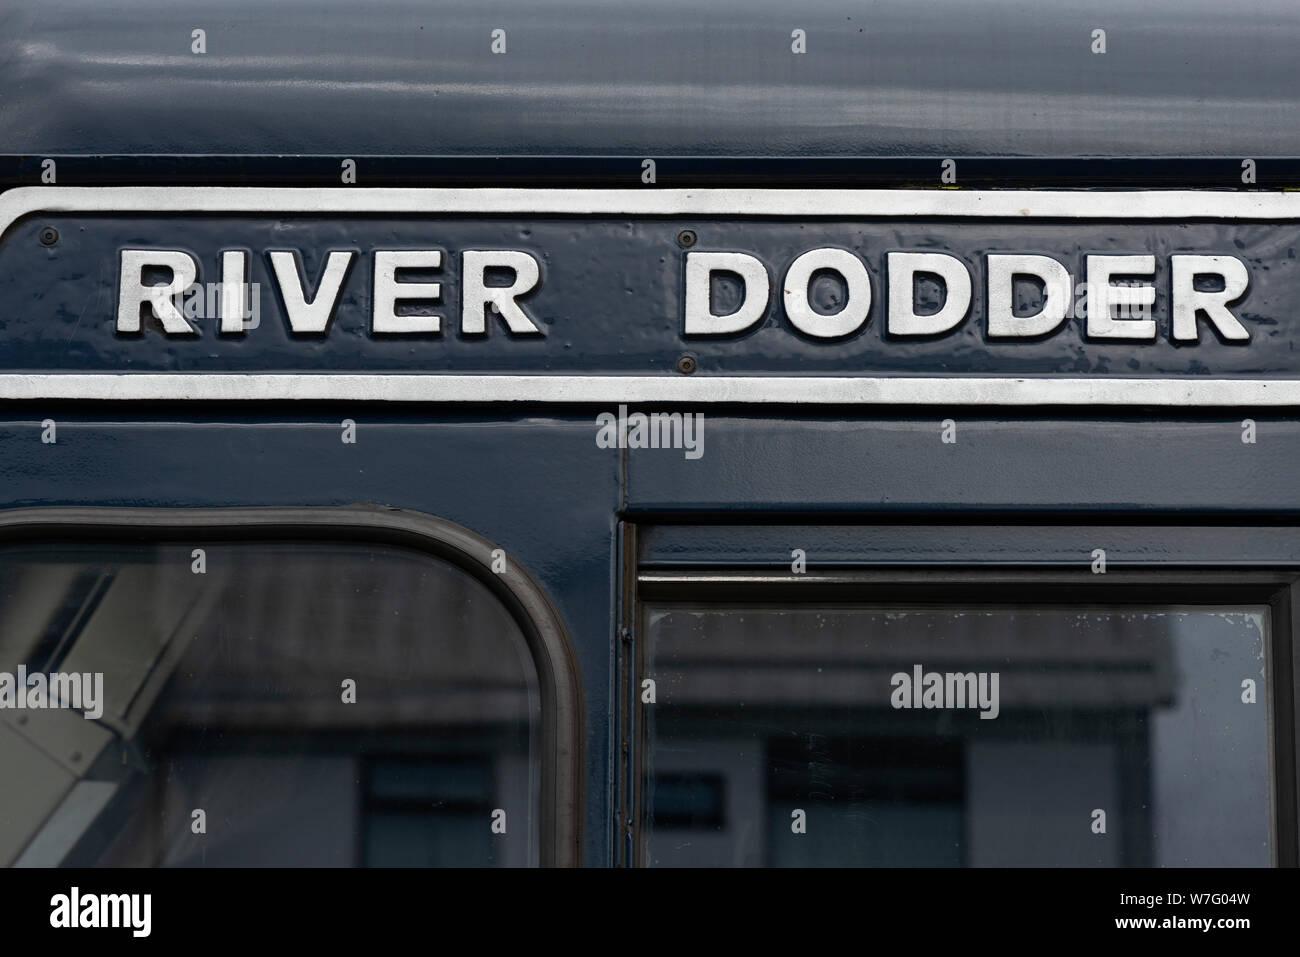 """River Dodder"" close up writing logo on a dark blue 201 Class diesel locomotive as the Belmond Grand Hibernian luxury sleeper dedicated locomotive. Stock Photo"